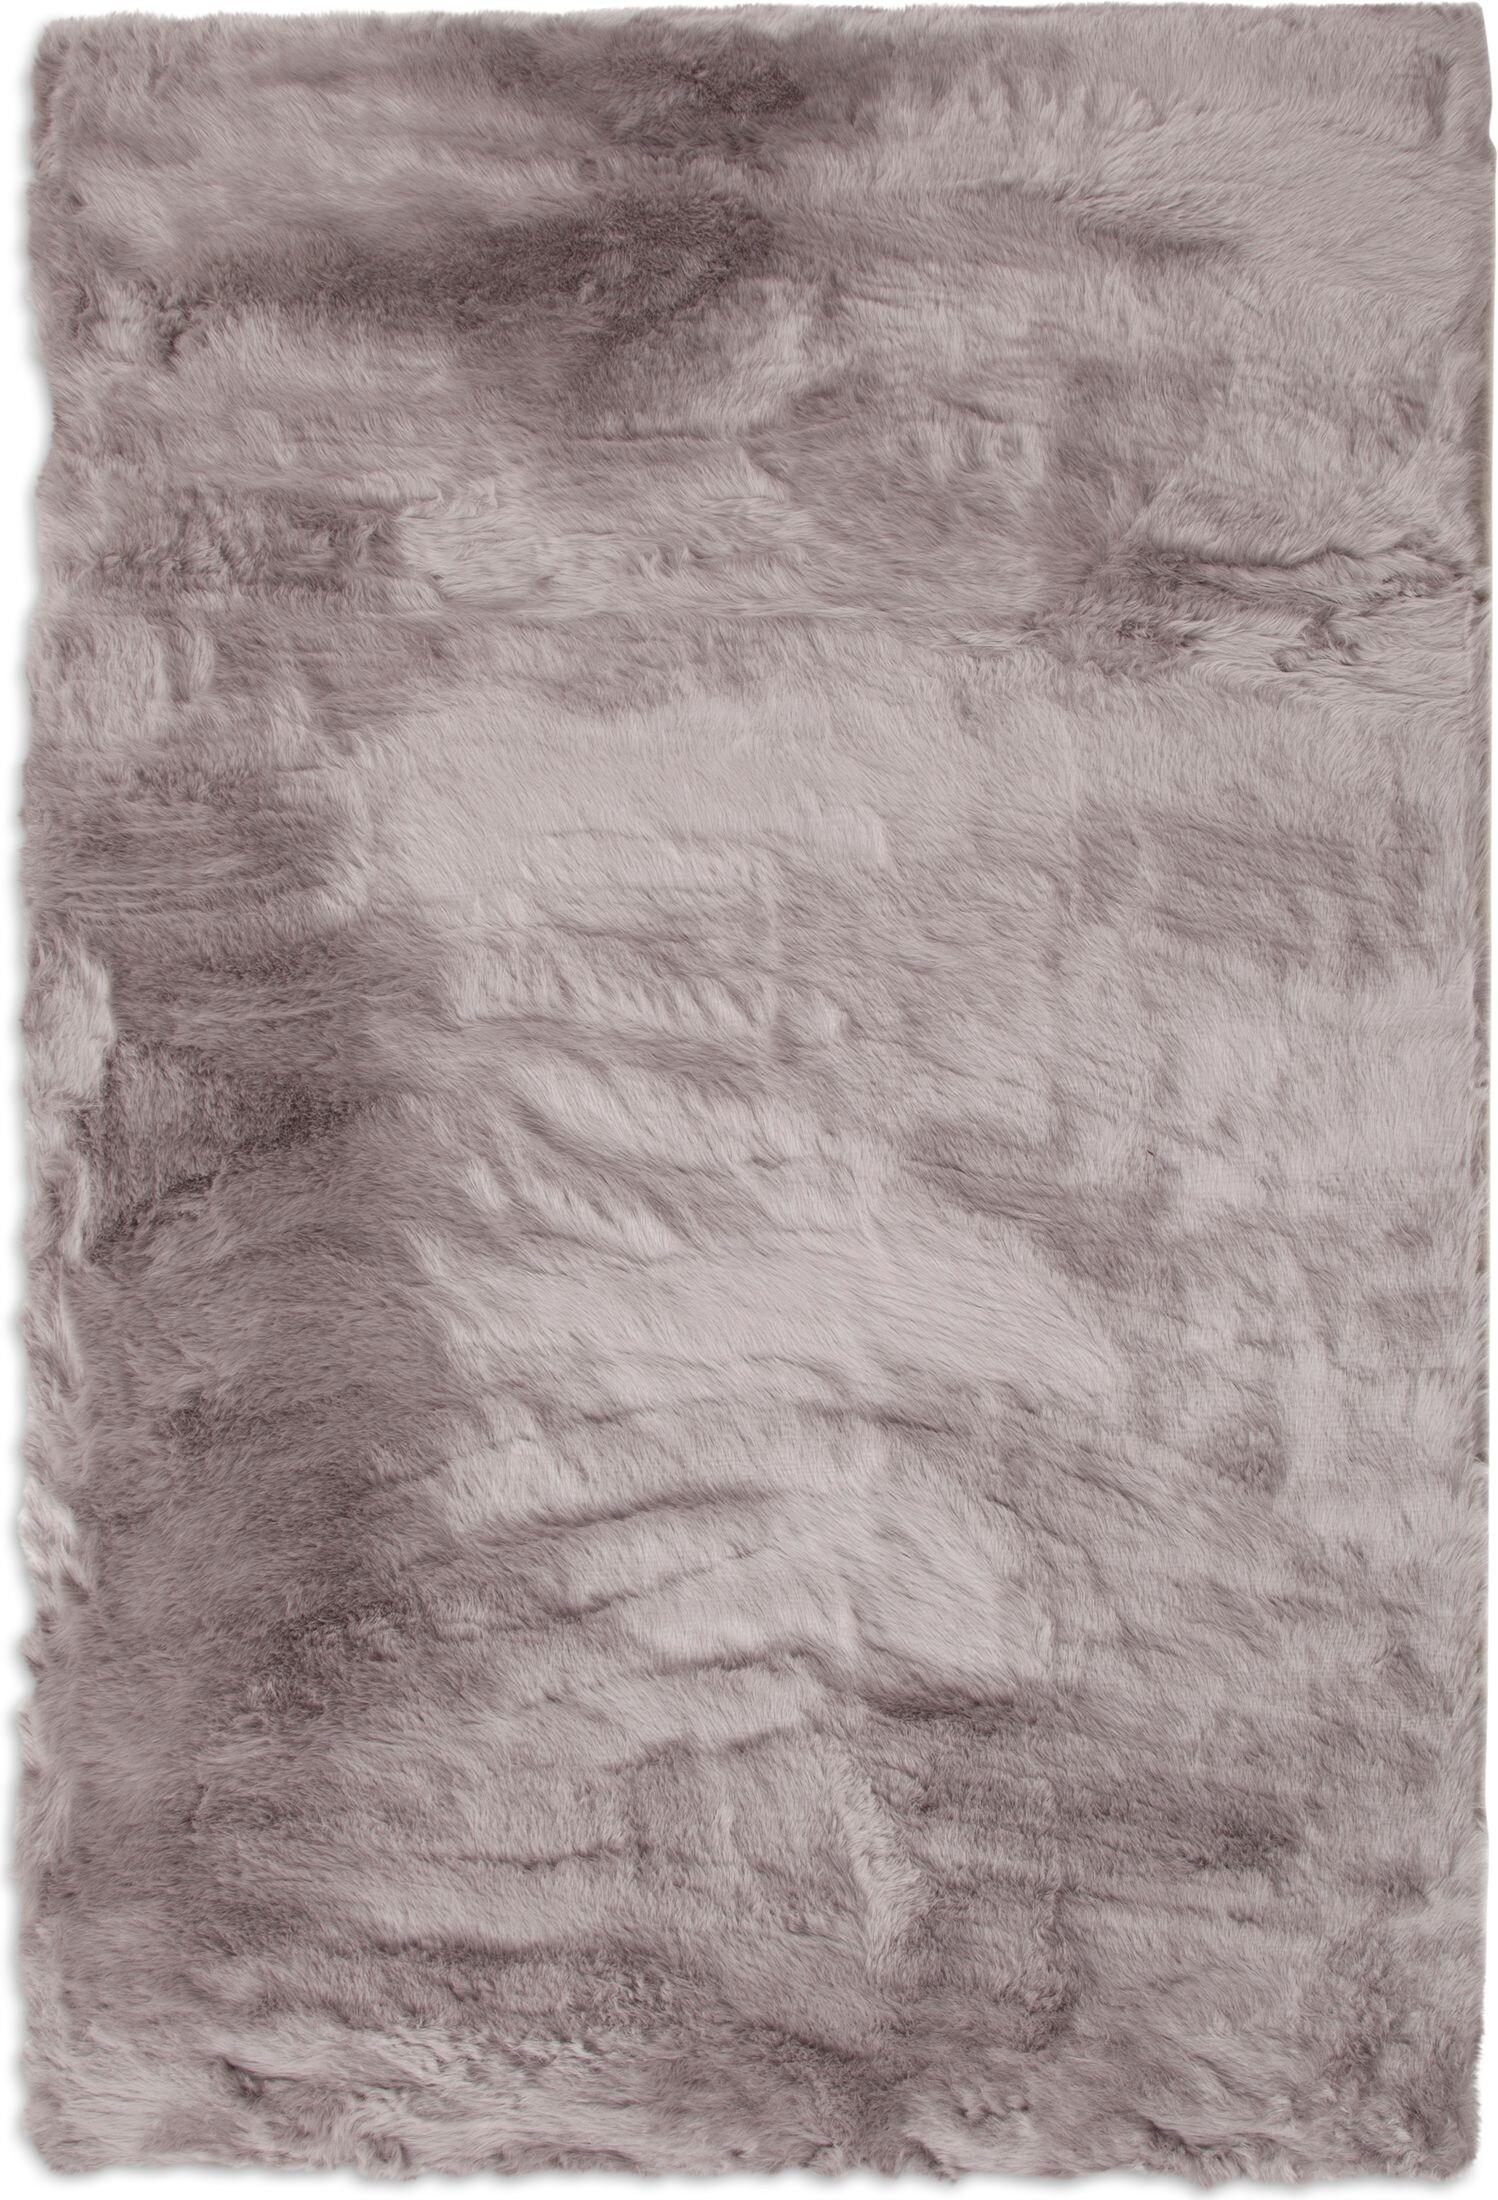 Rugs - Faux Mink Fur Area Rug - Silver